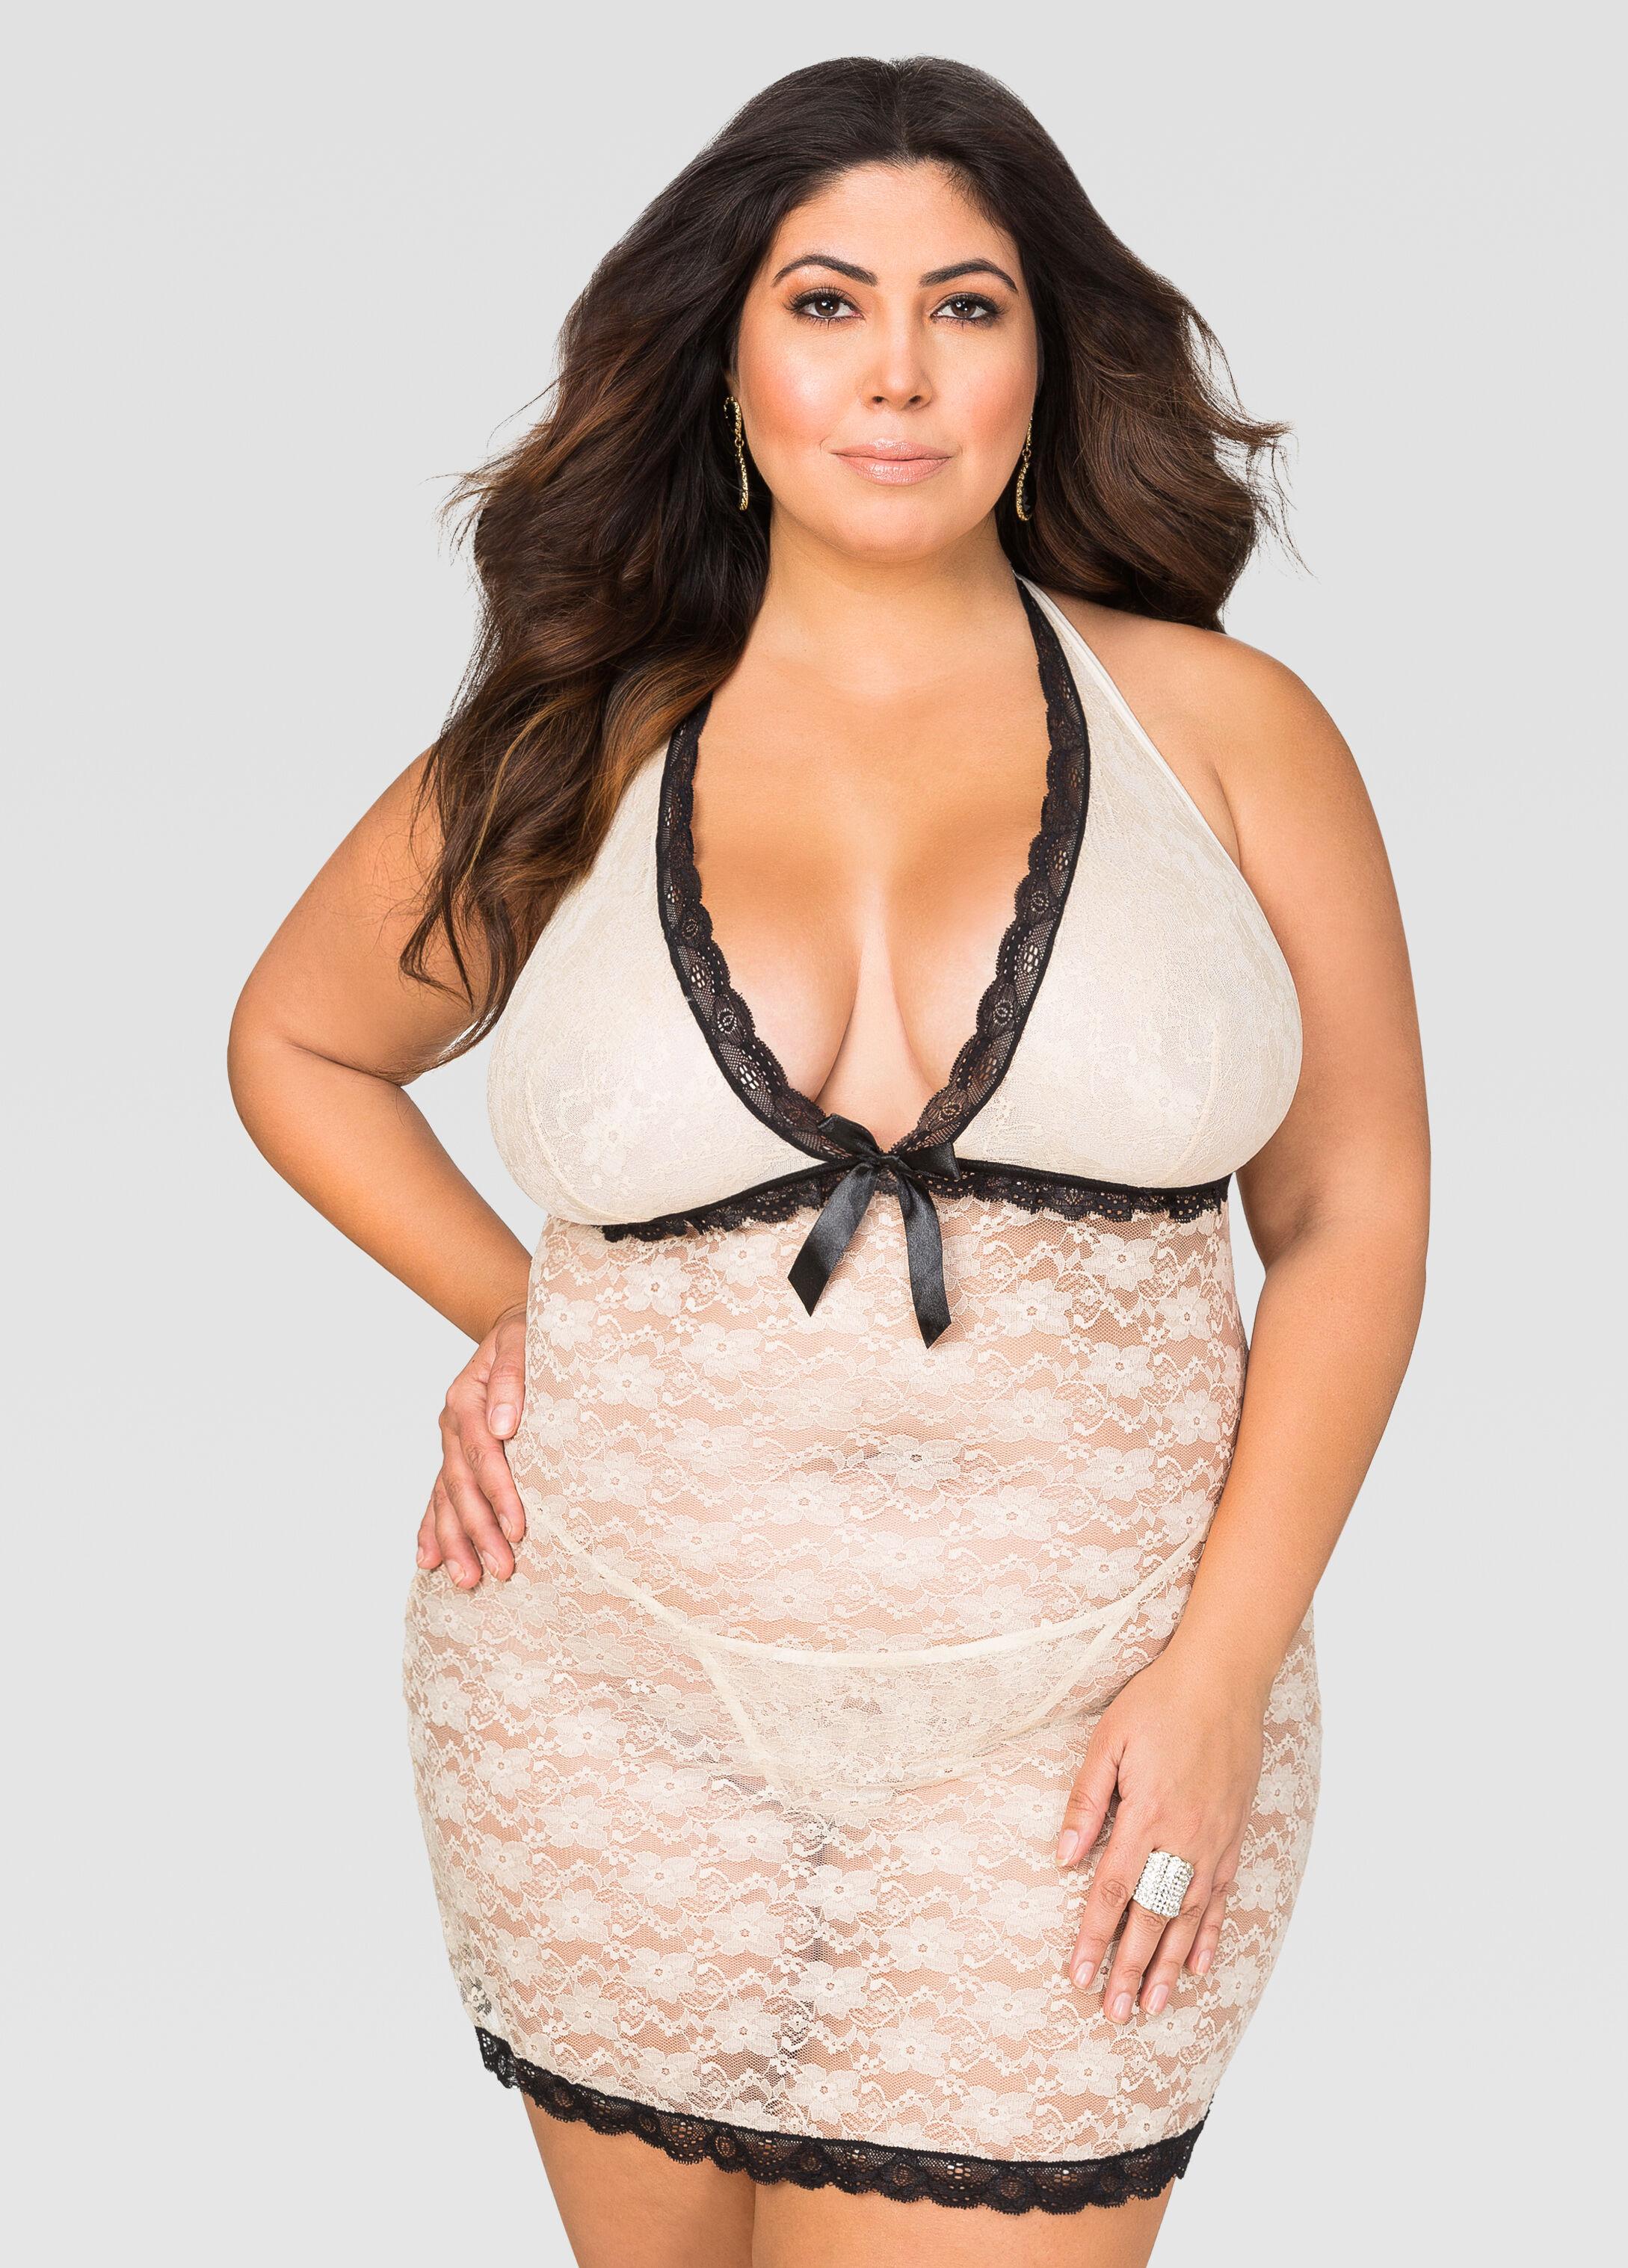 Plus size model Jessica Milagros | Jessica Milagros | Pinterest ...